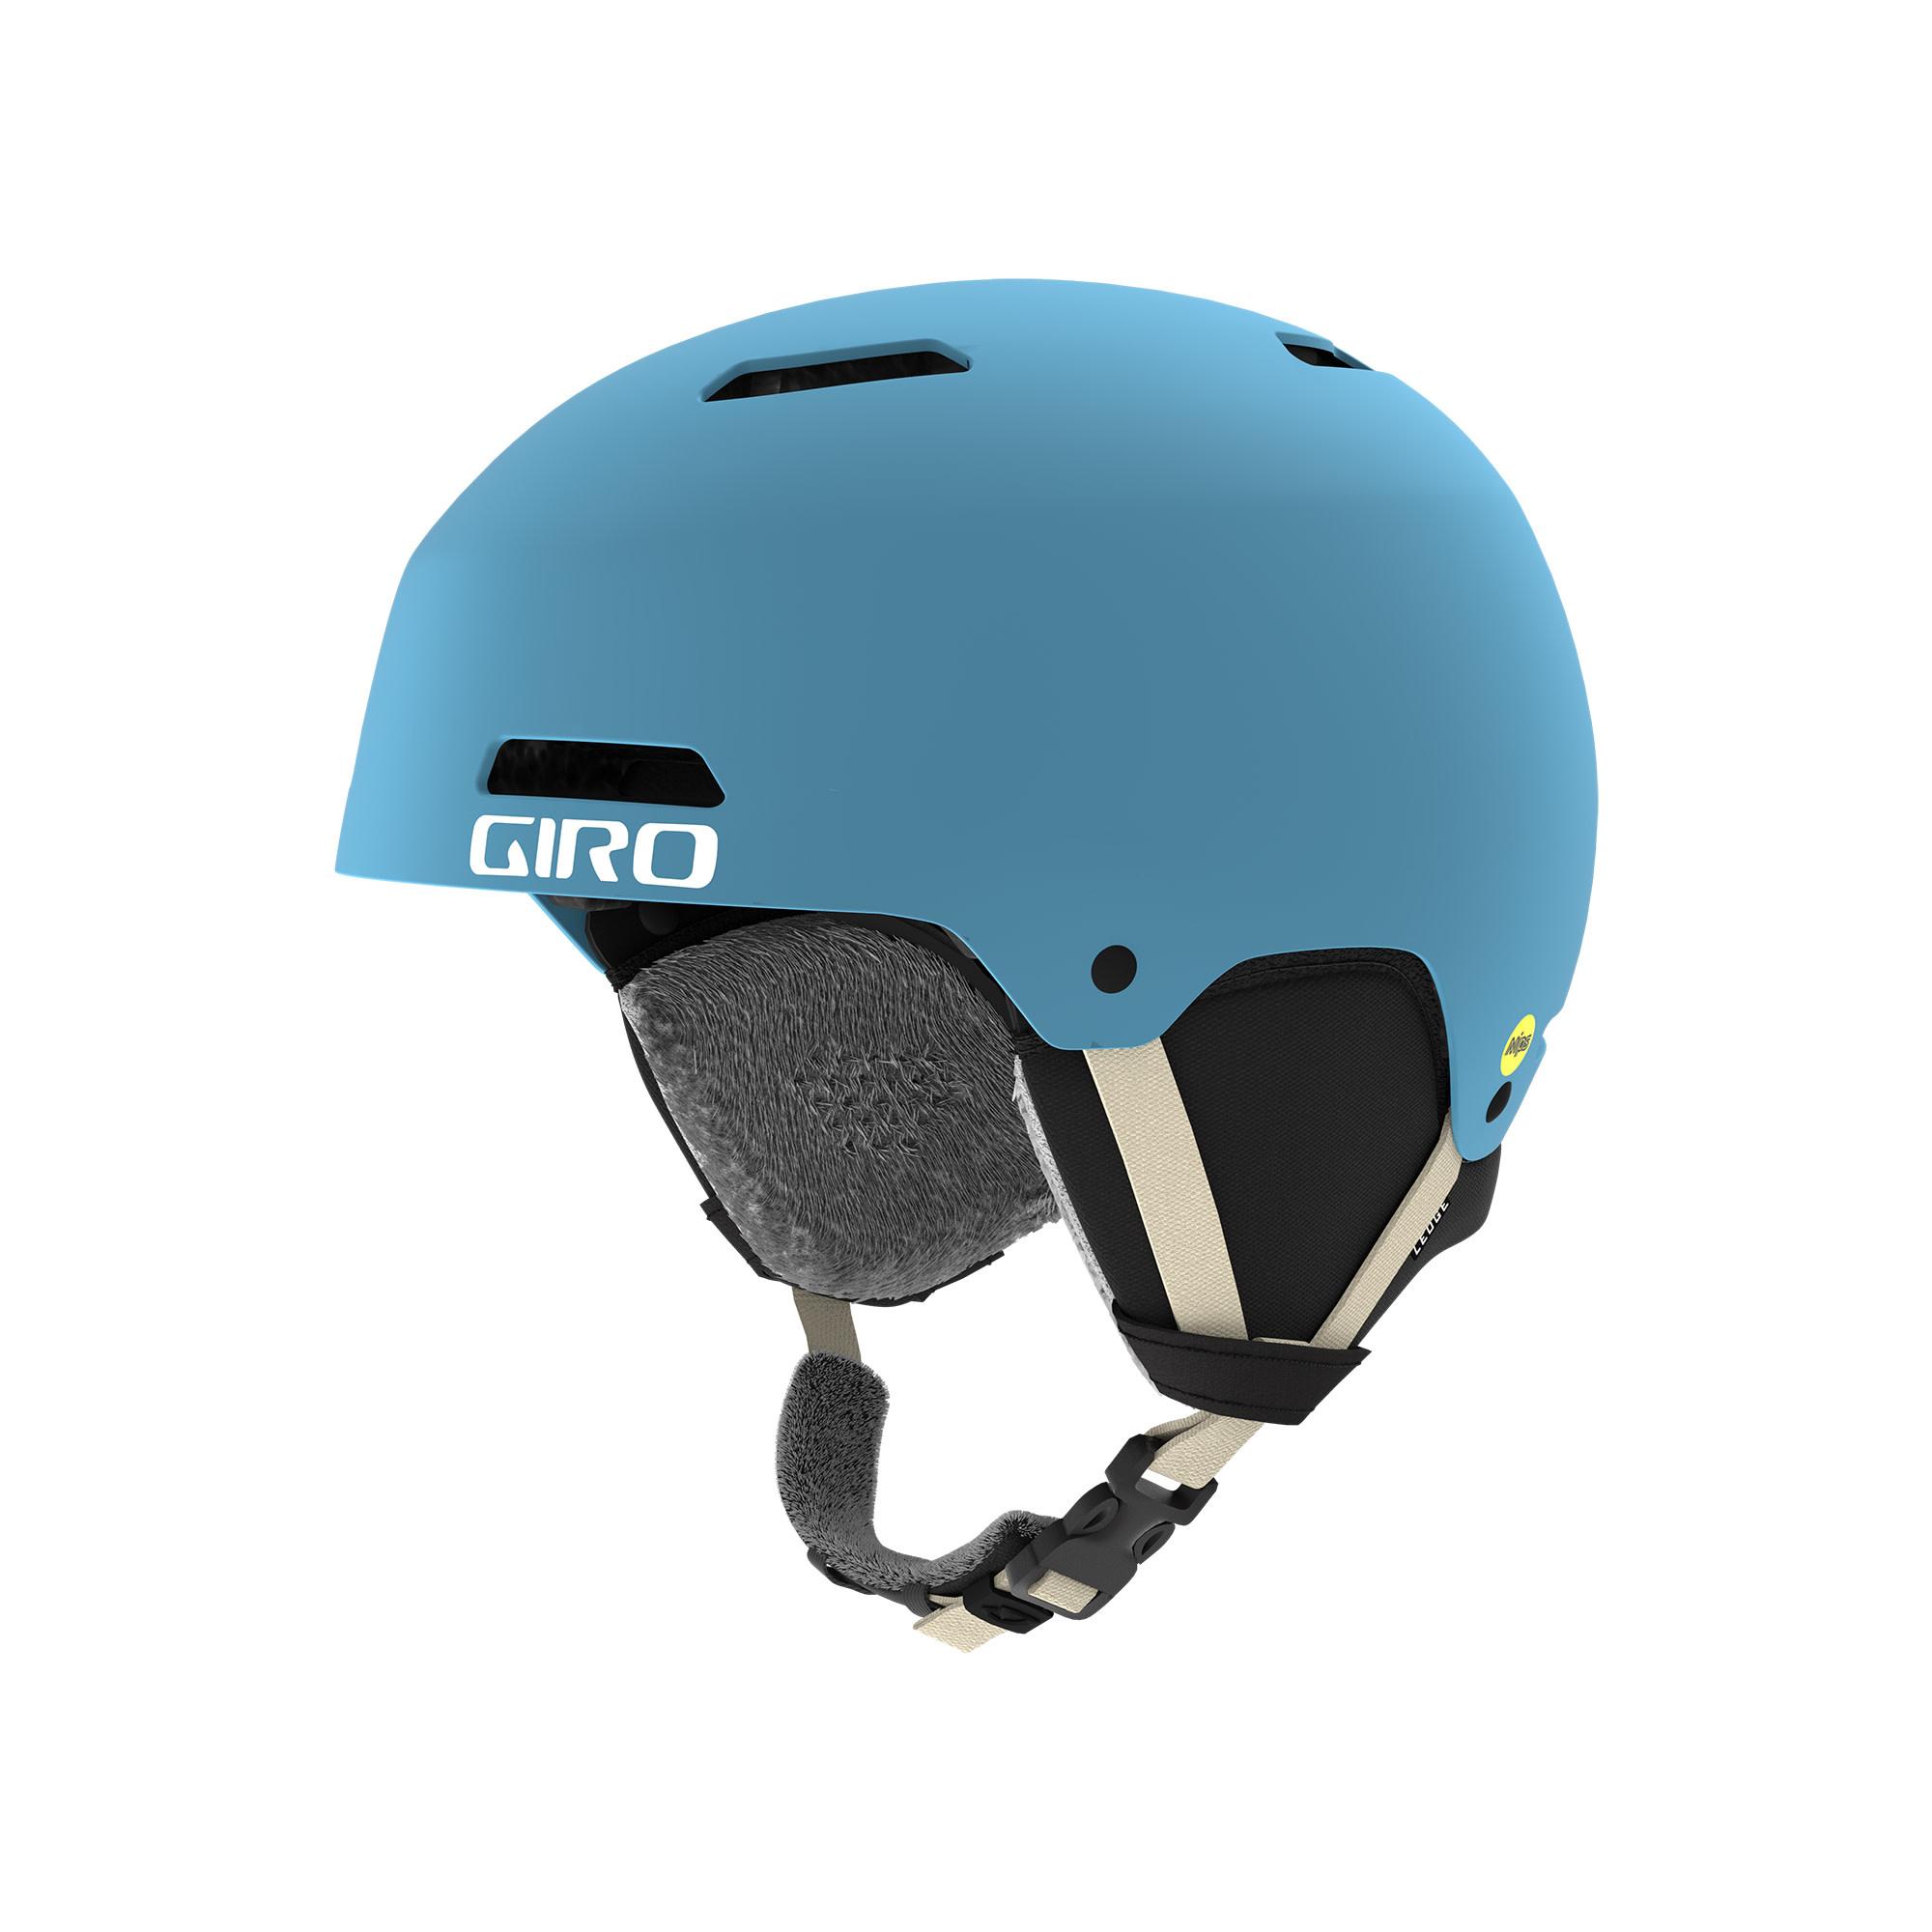 Giro Ledge FS MIPS-6